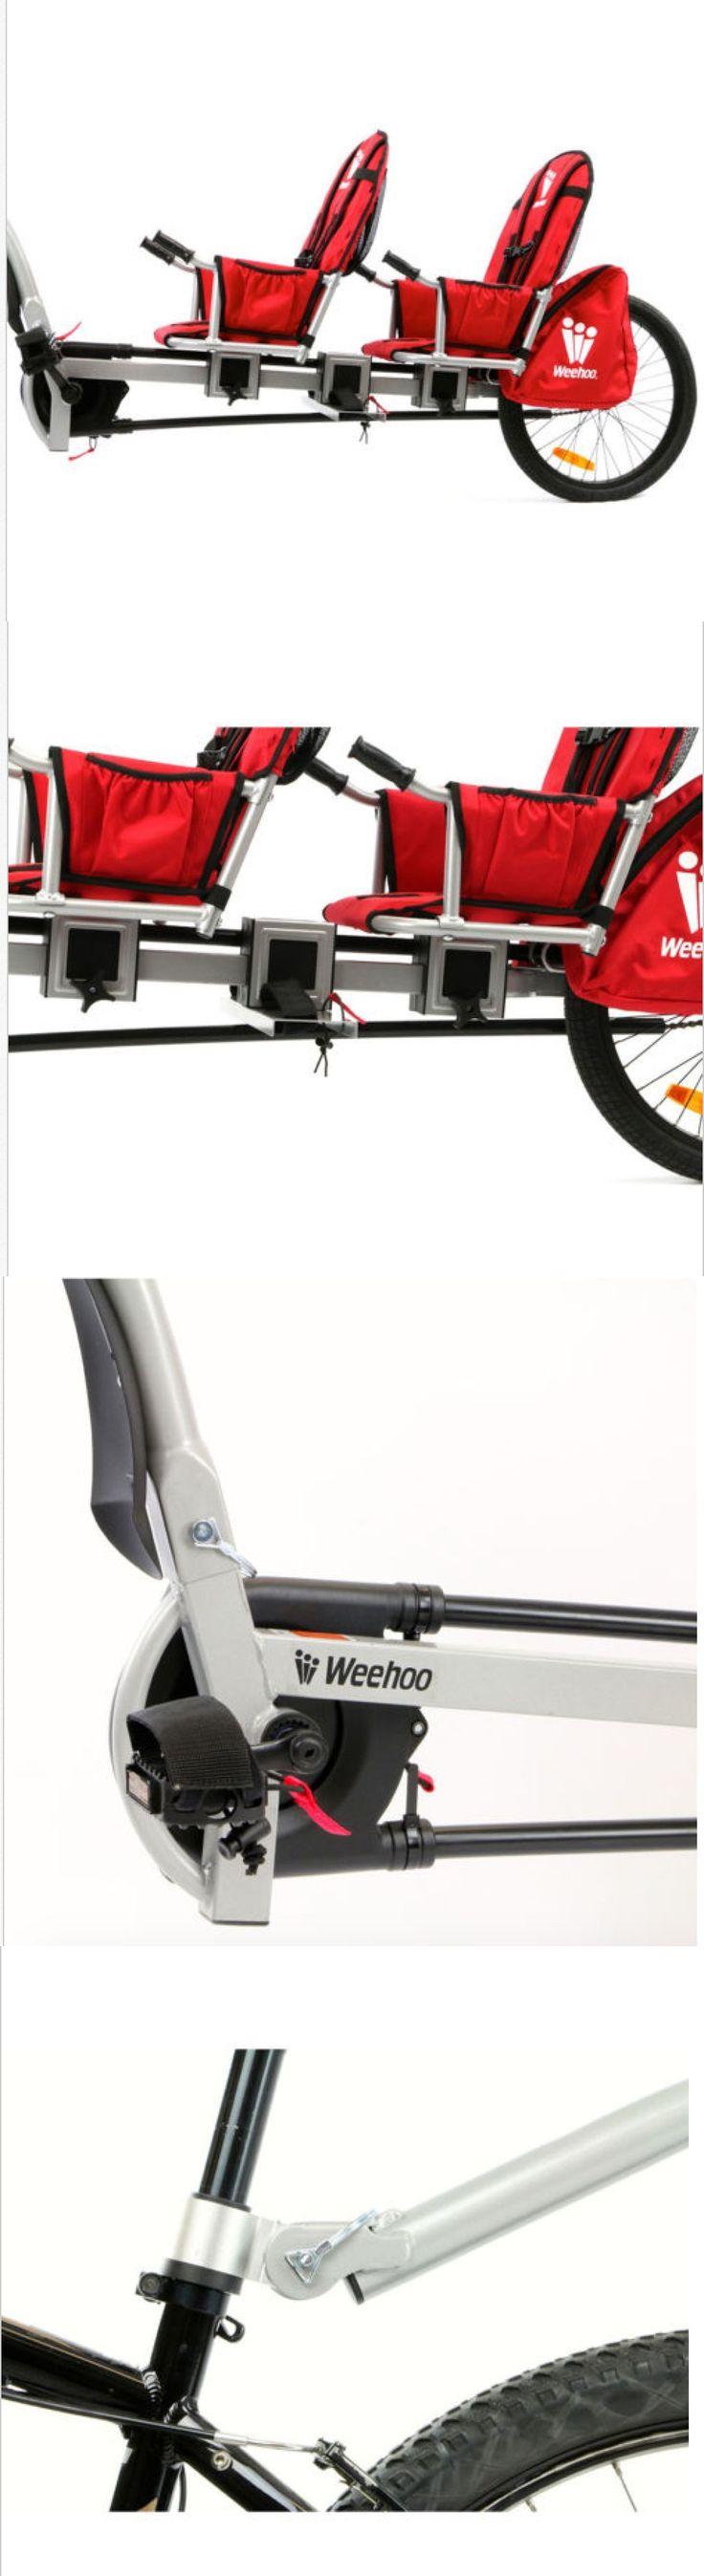 Trailers 85040: New Weehoo Igo Two Tag Along Kids Bicycle Bike Trailer | 2 Seats | K1020 -> BUY IT NOW ONLY: $499 on eBay!